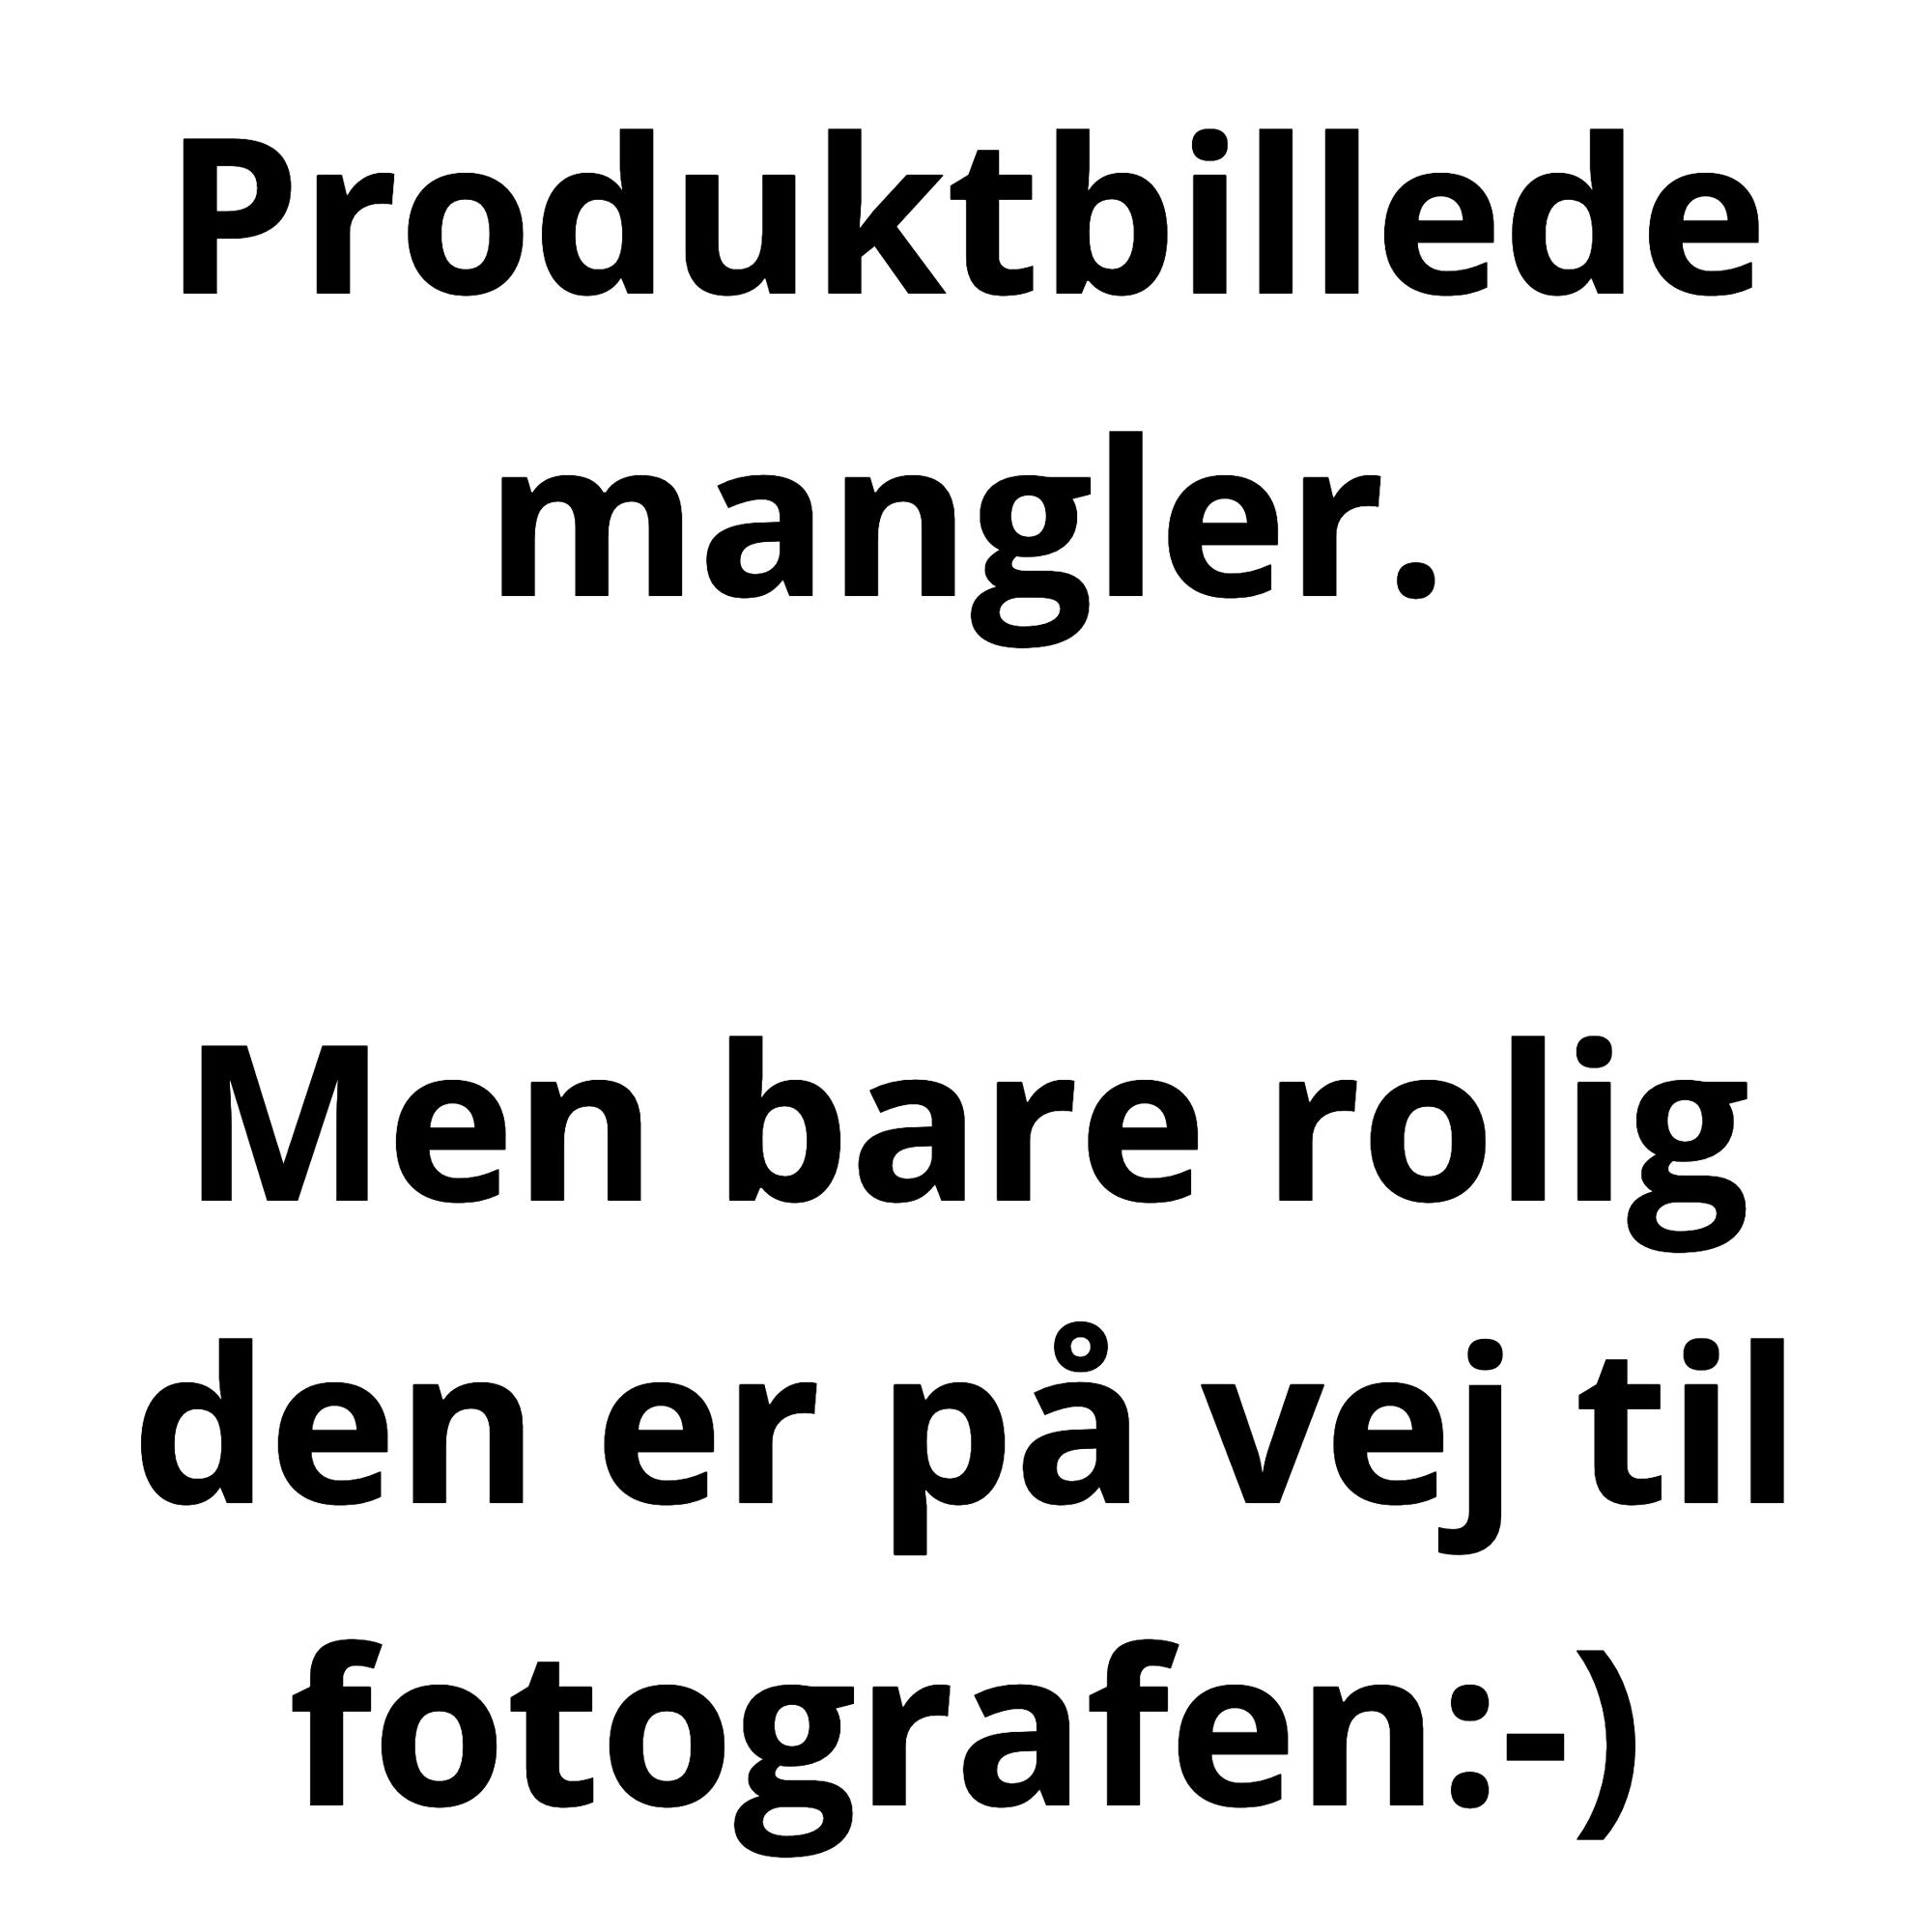 Incipio Octane Beskyttelsescover til Microsoft Lumia 650 - Klar